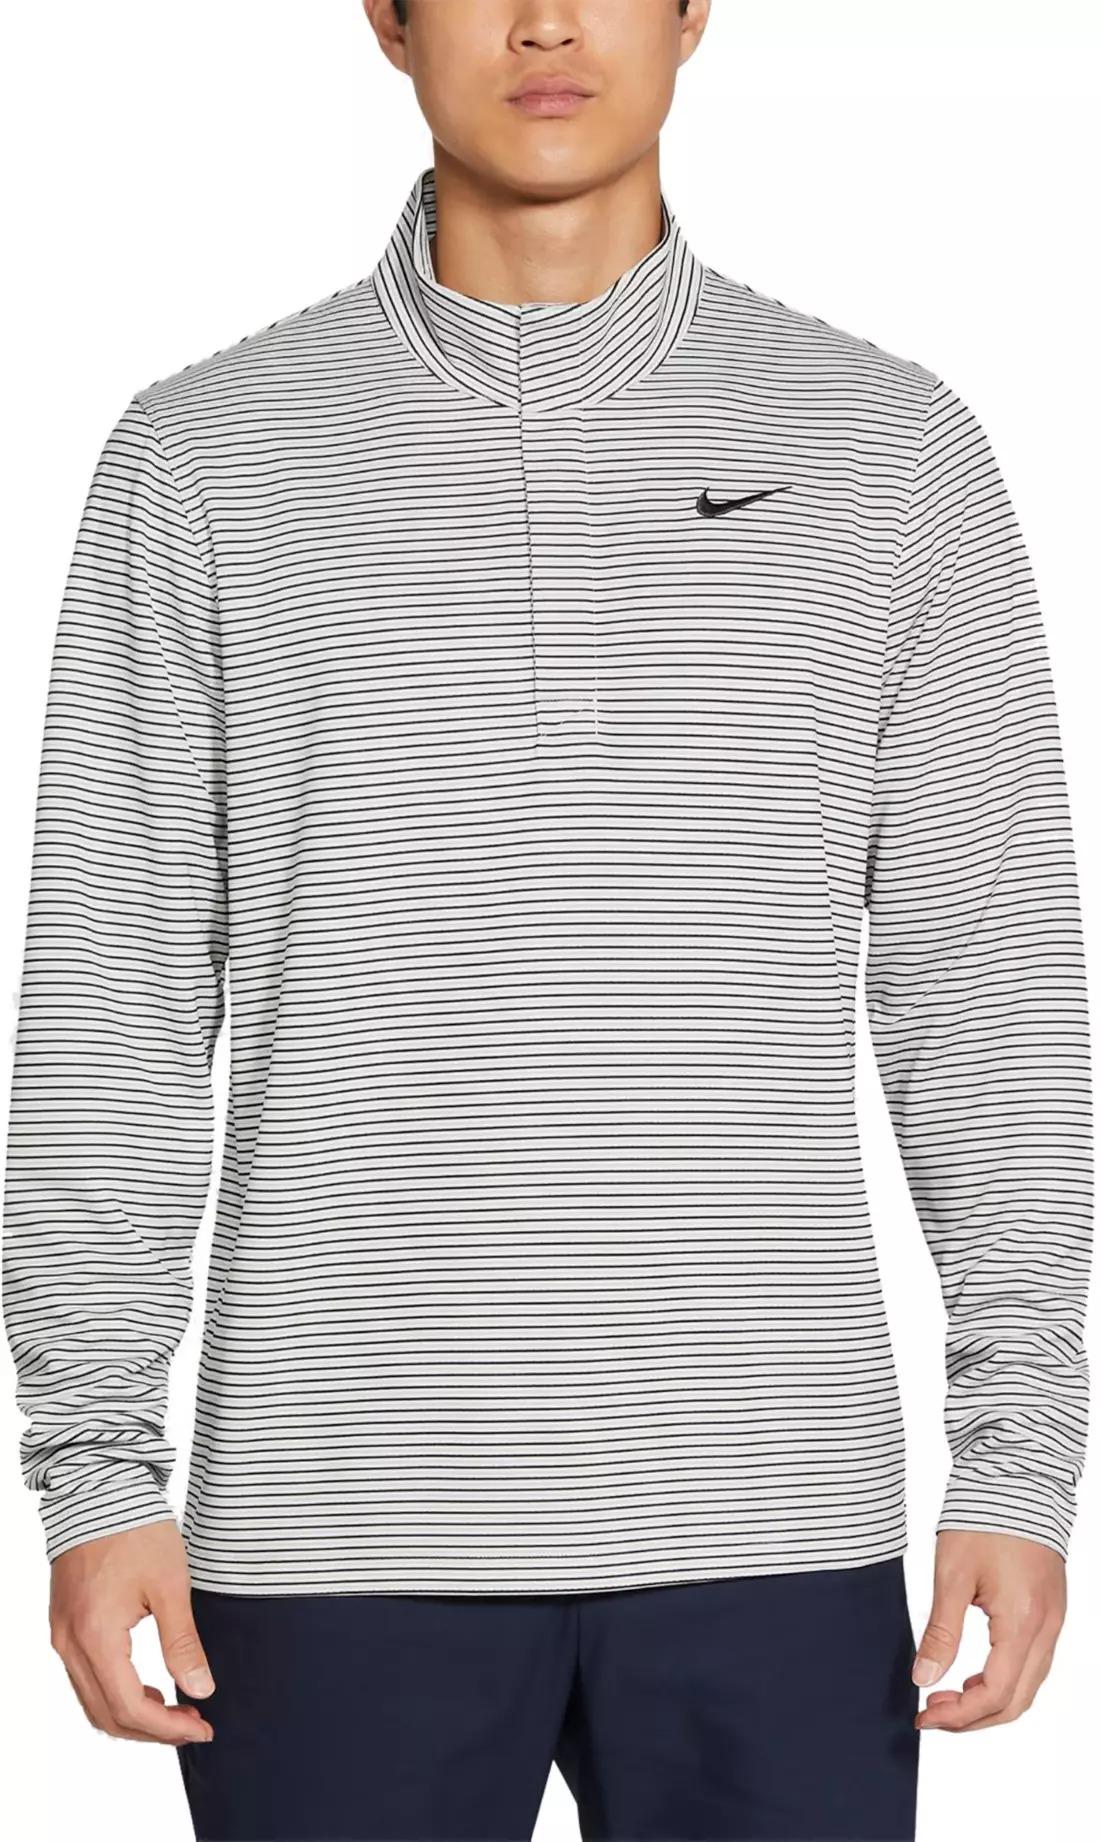 mock neck sweater Nike Men's Dri-FIT Victory ½ Zip Golf Pullover